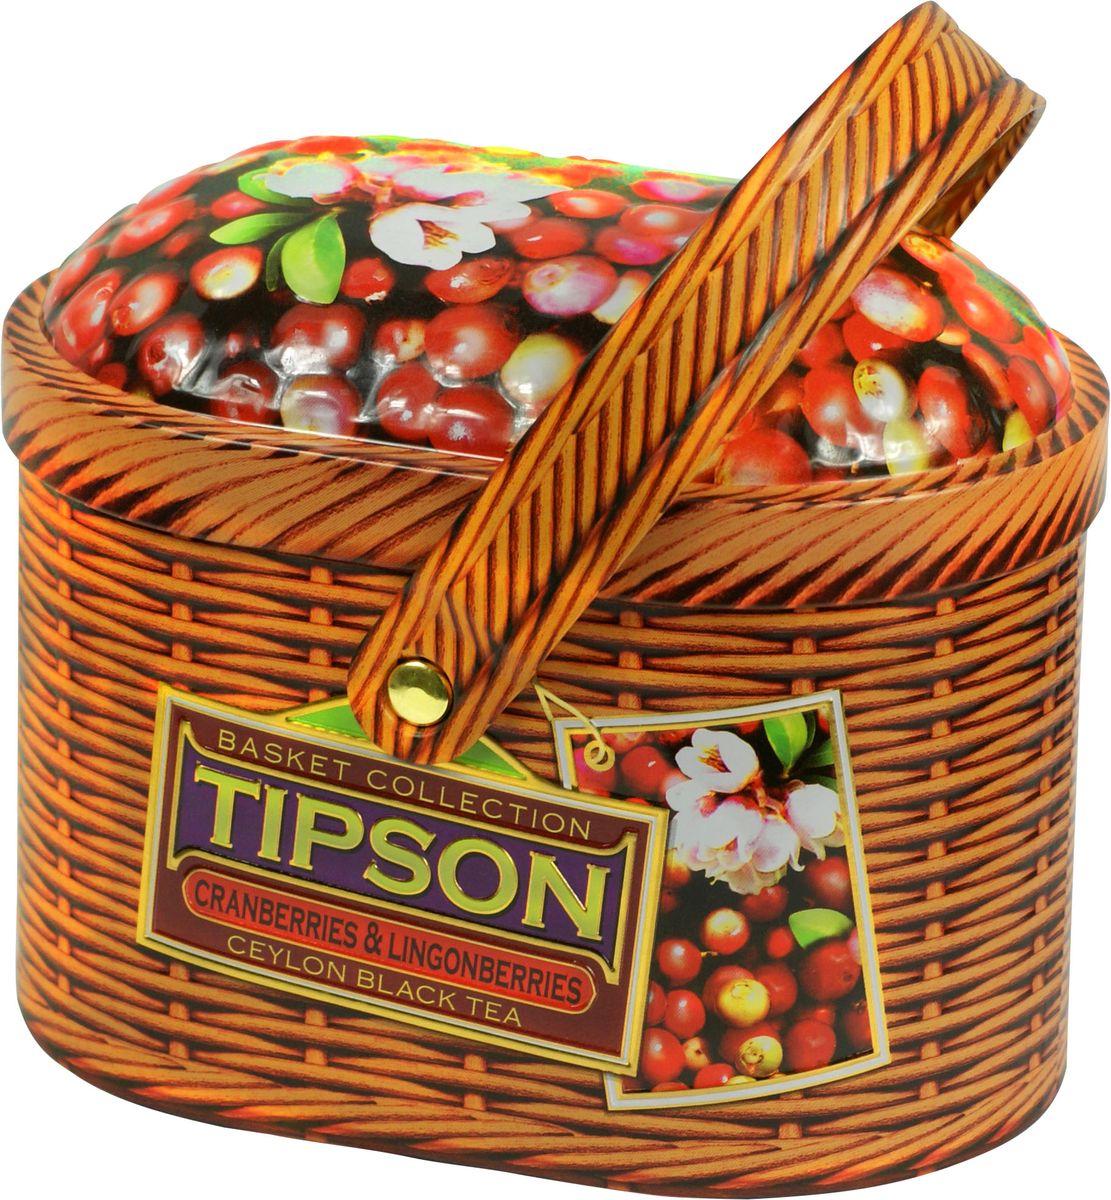 Tipson Cranberries and Lingonberries черный листовой чай, 100 г (жестяная банка) tipson pearl зеленый листовой чай 75 г жестяная банка